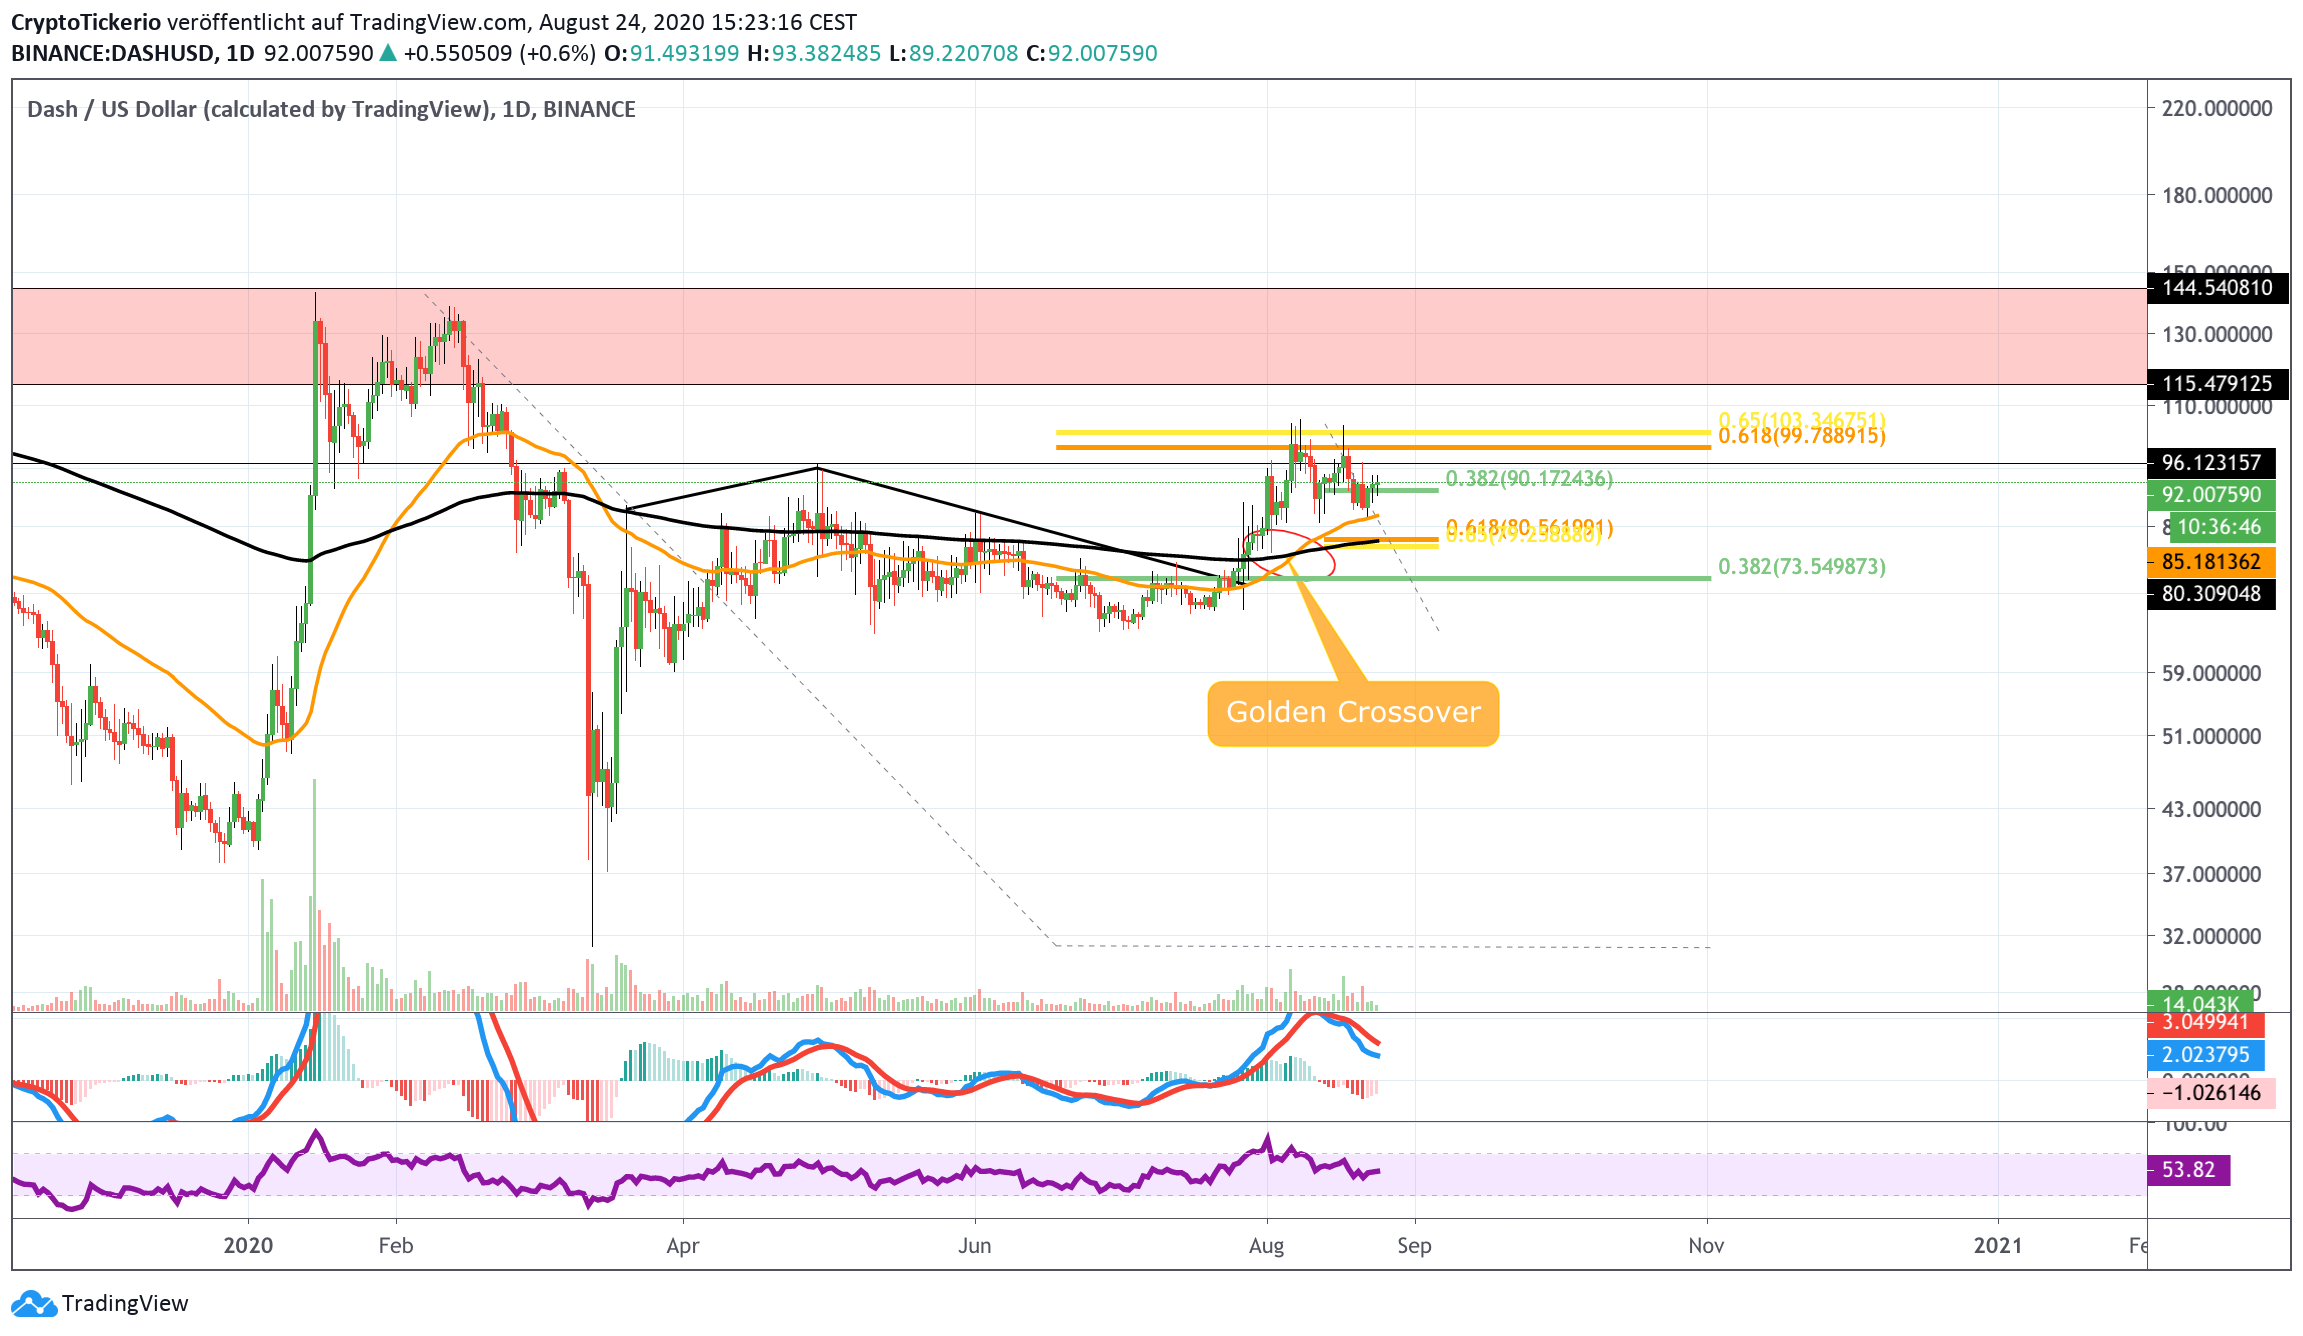 DASH/USD Daily– Tradingview